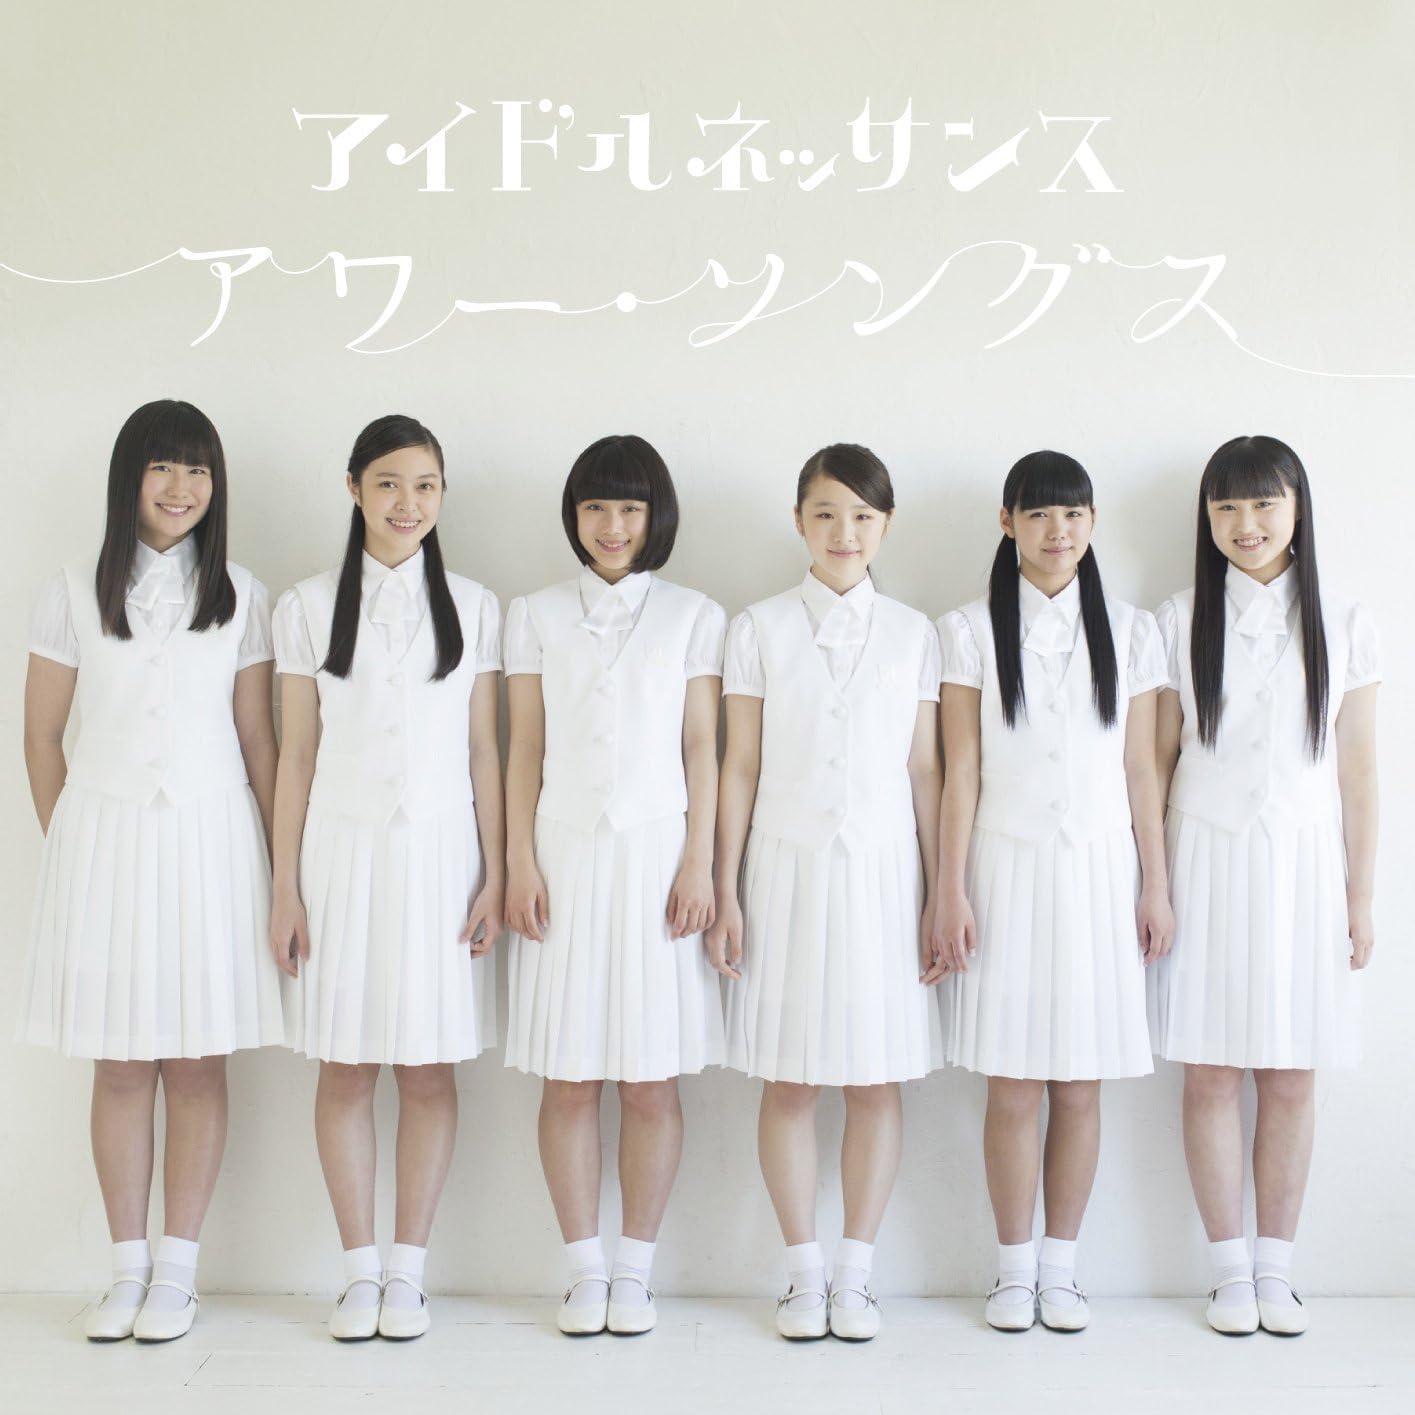 Amazon.co.jp: アワー・ソングス: 音楽